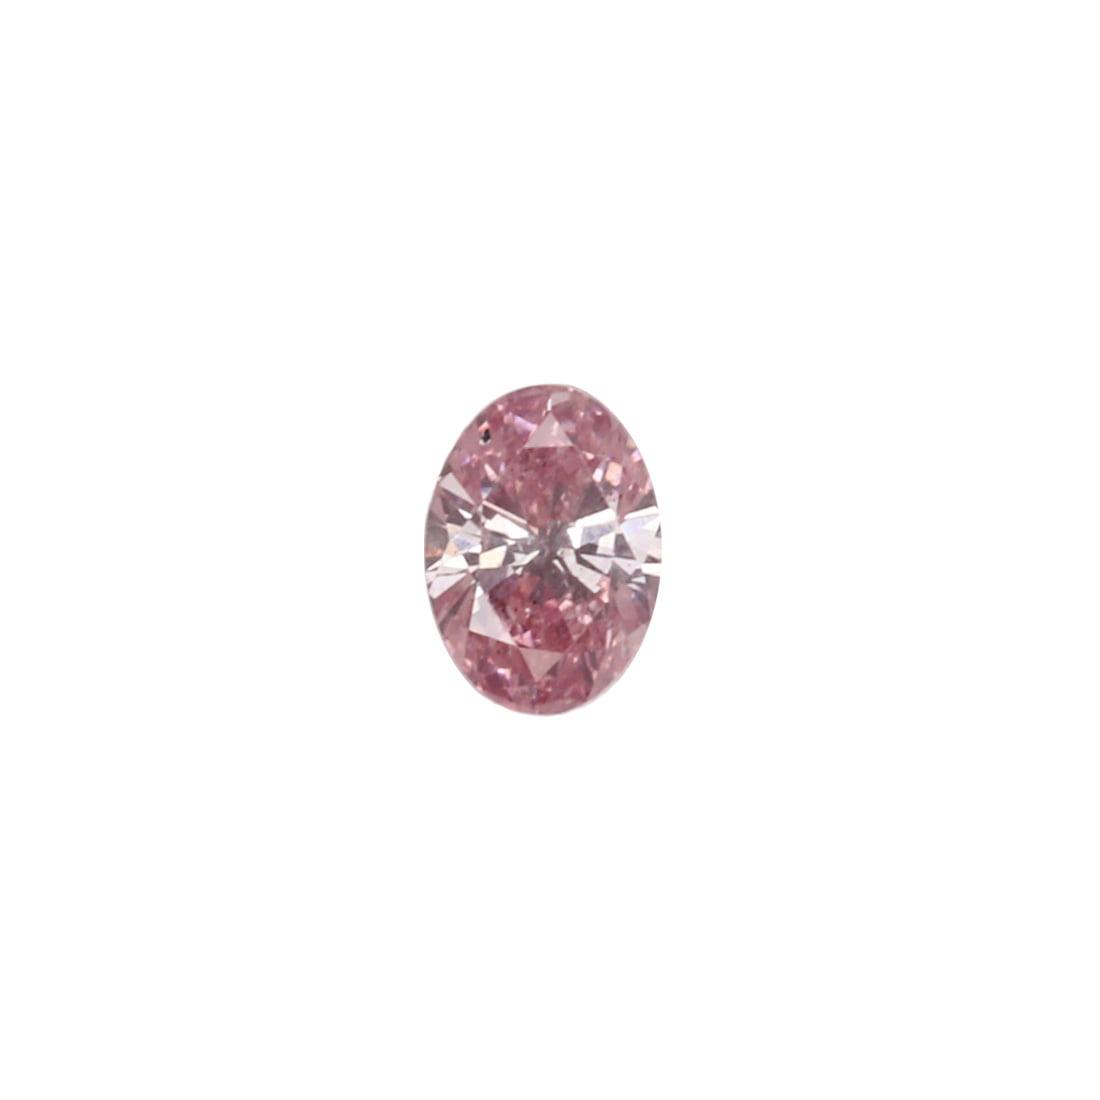 0.20ct Natural Fancy Pink, 6P Argyle Diamond